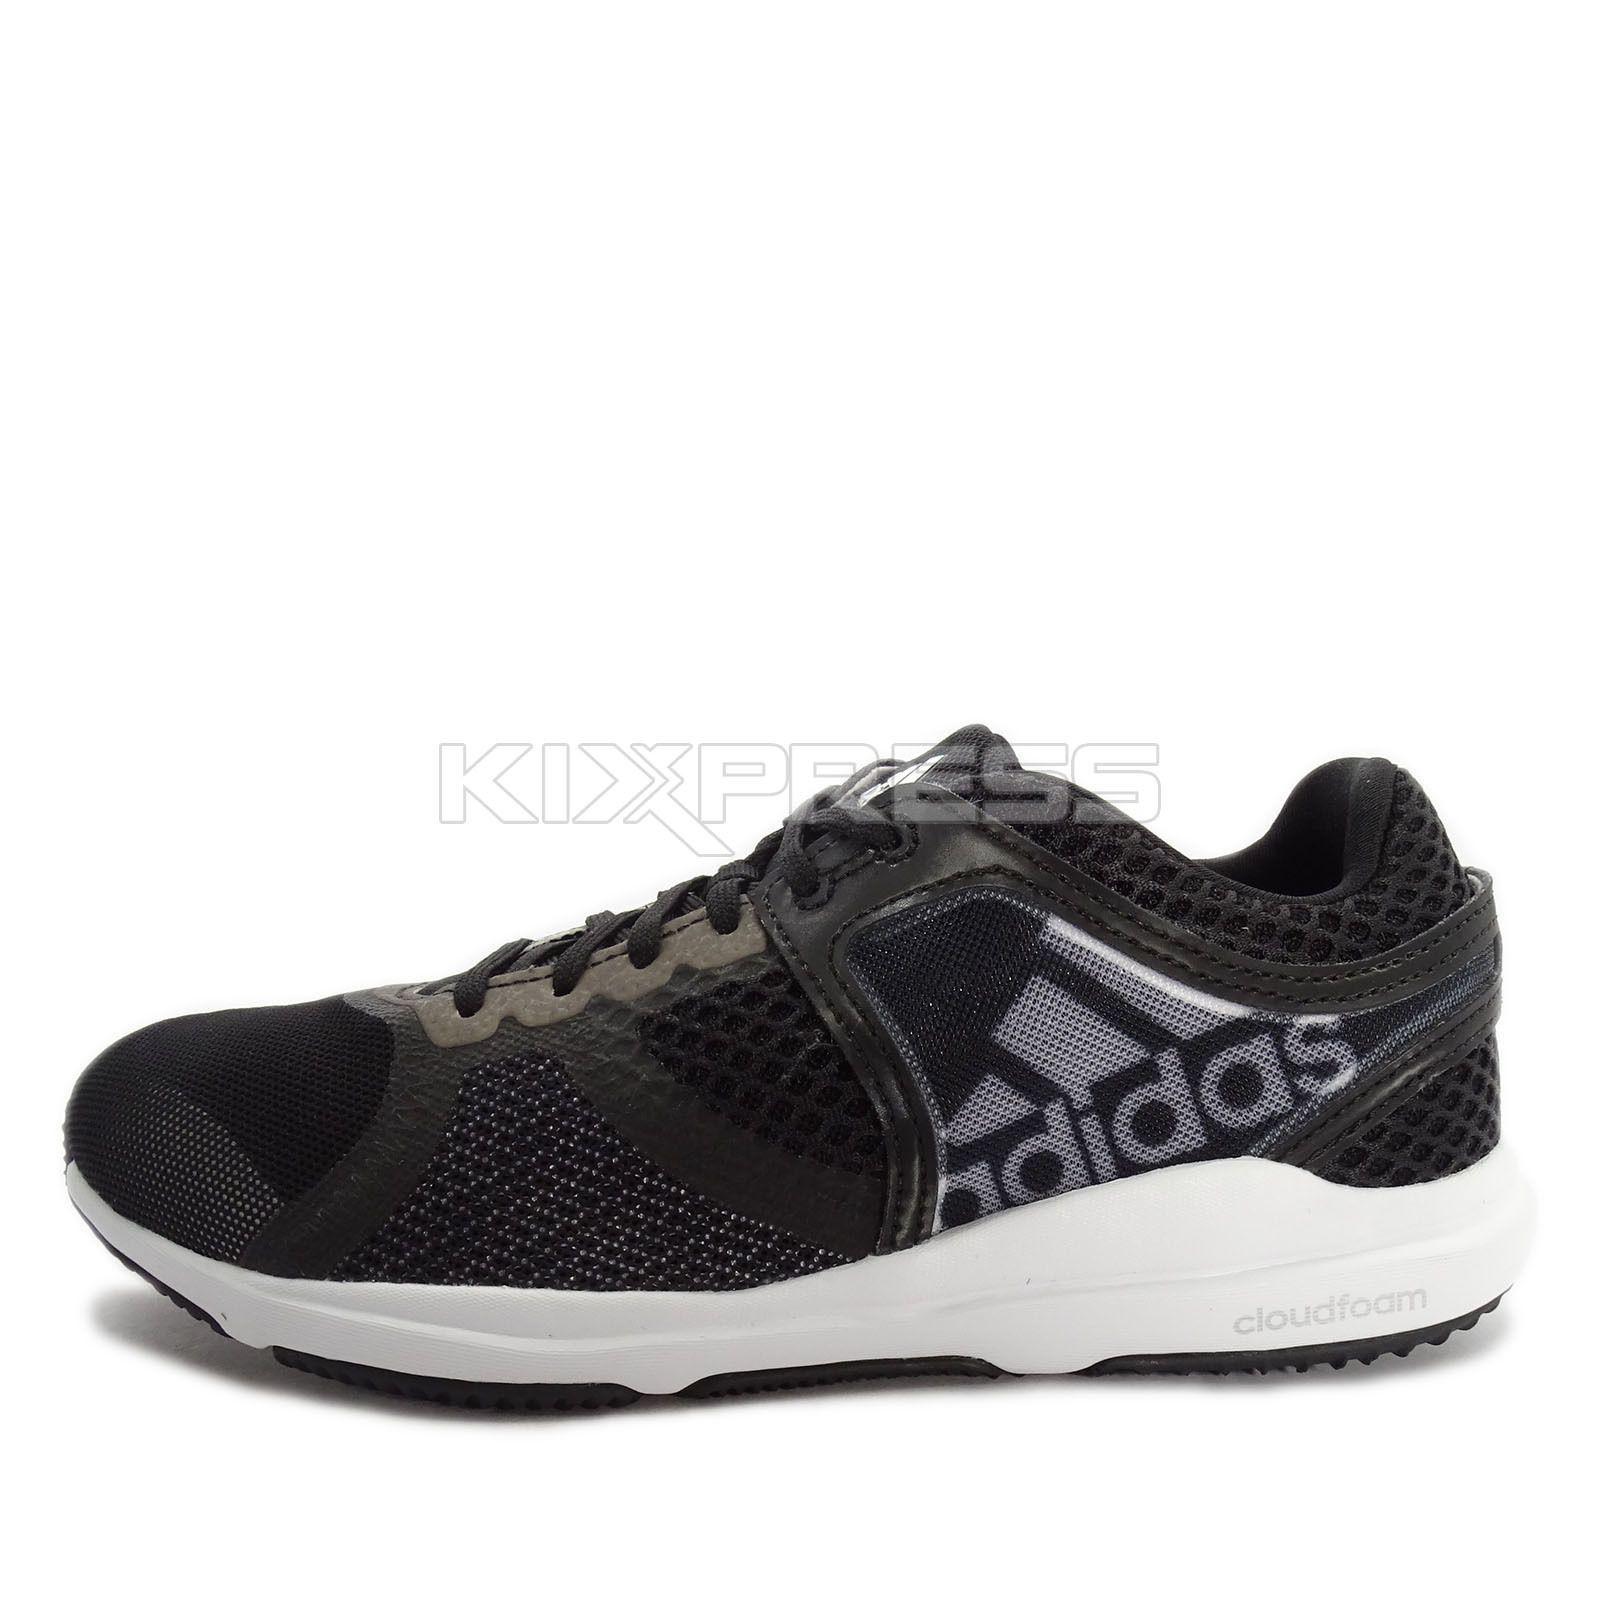 adidas Crazymove CF W Black White Womens Cross Training Shoes Trainers